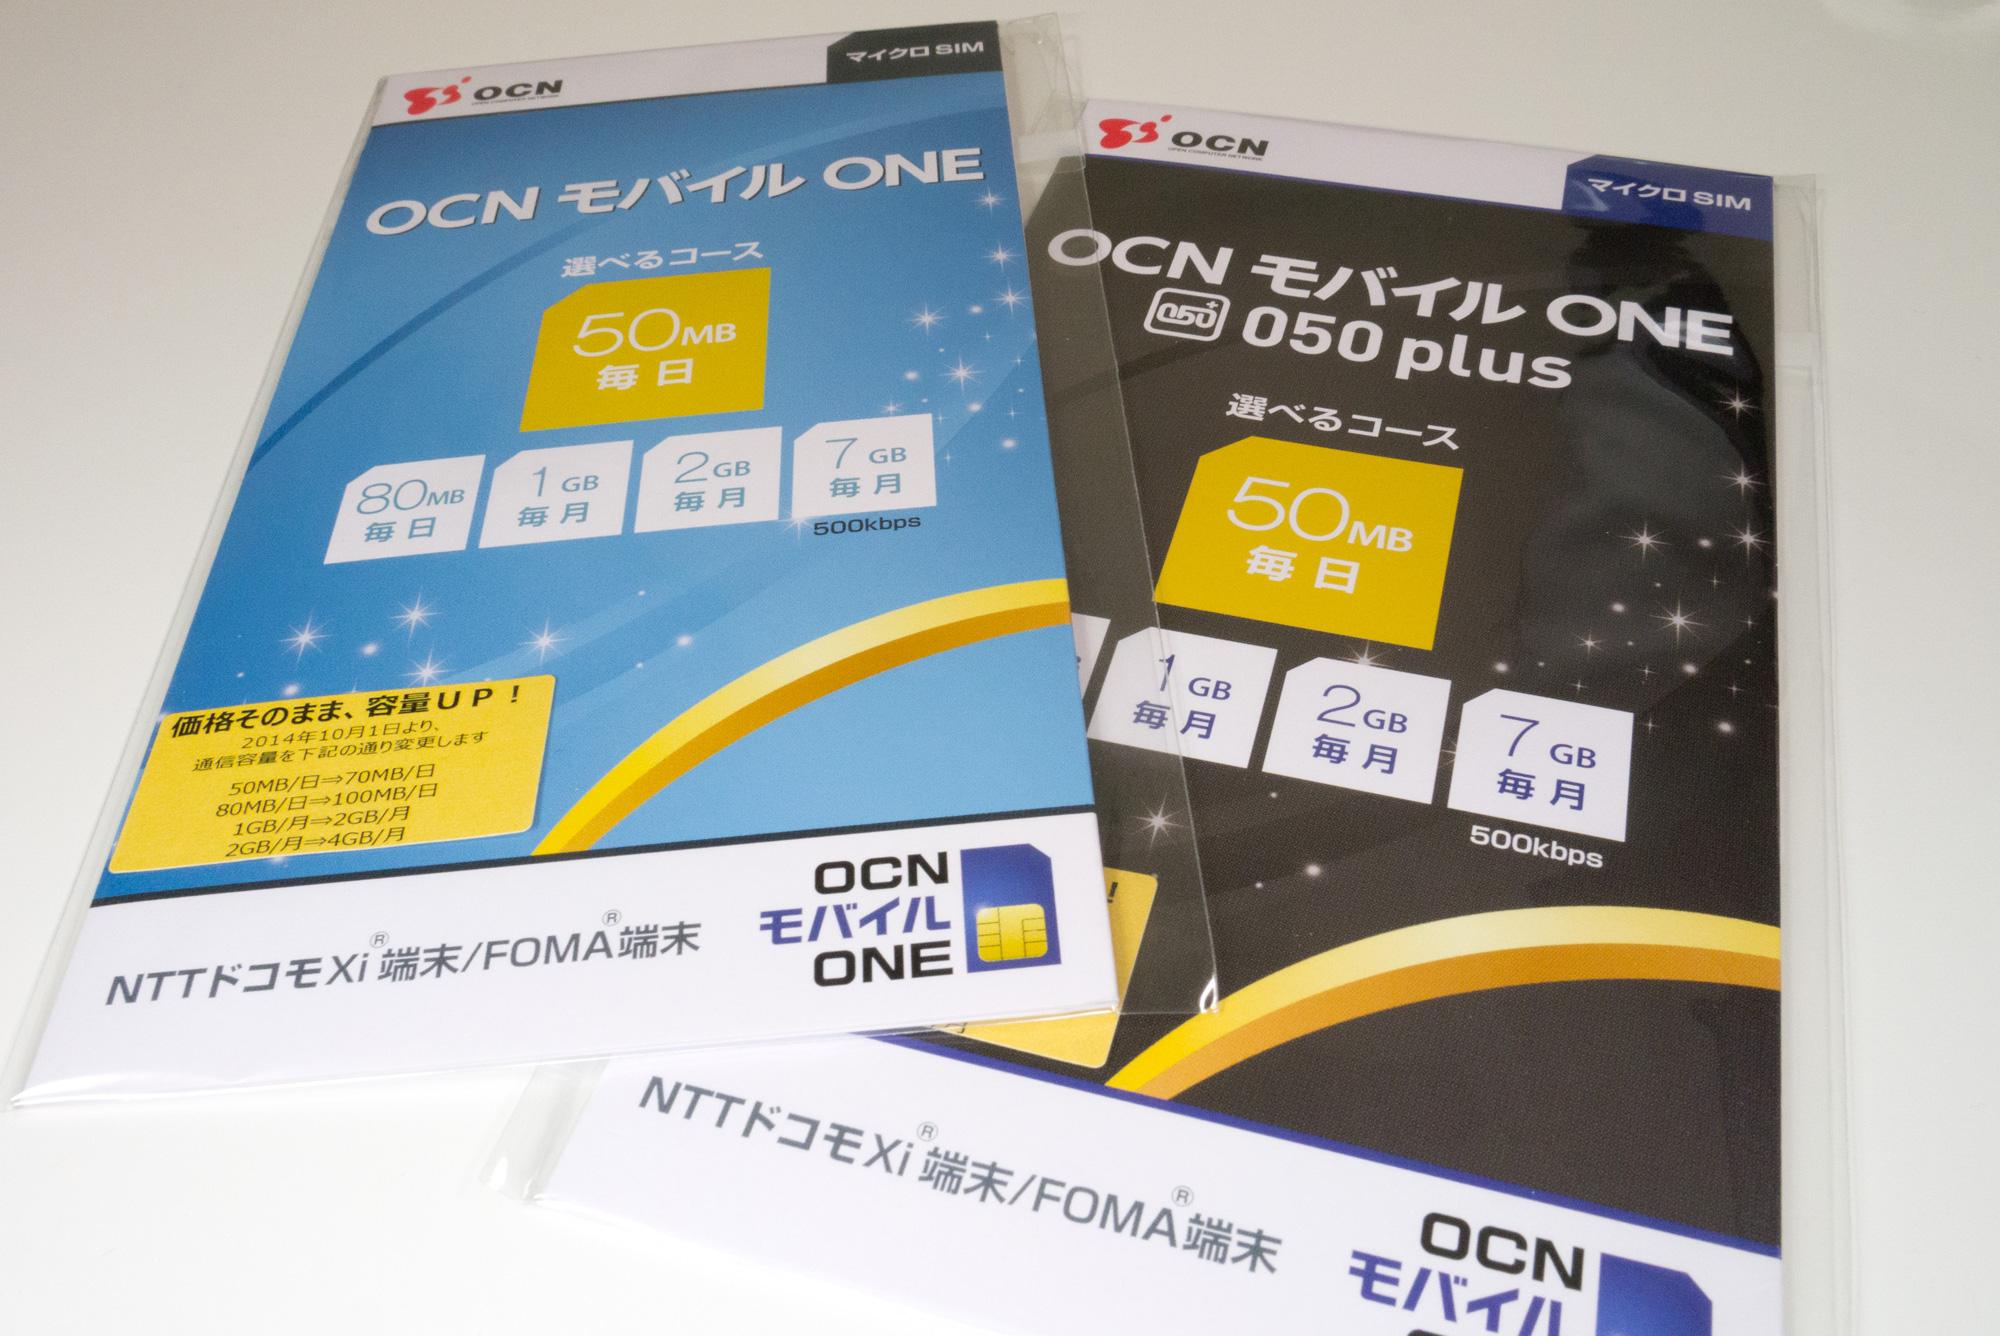 ocn-mobile-one_package